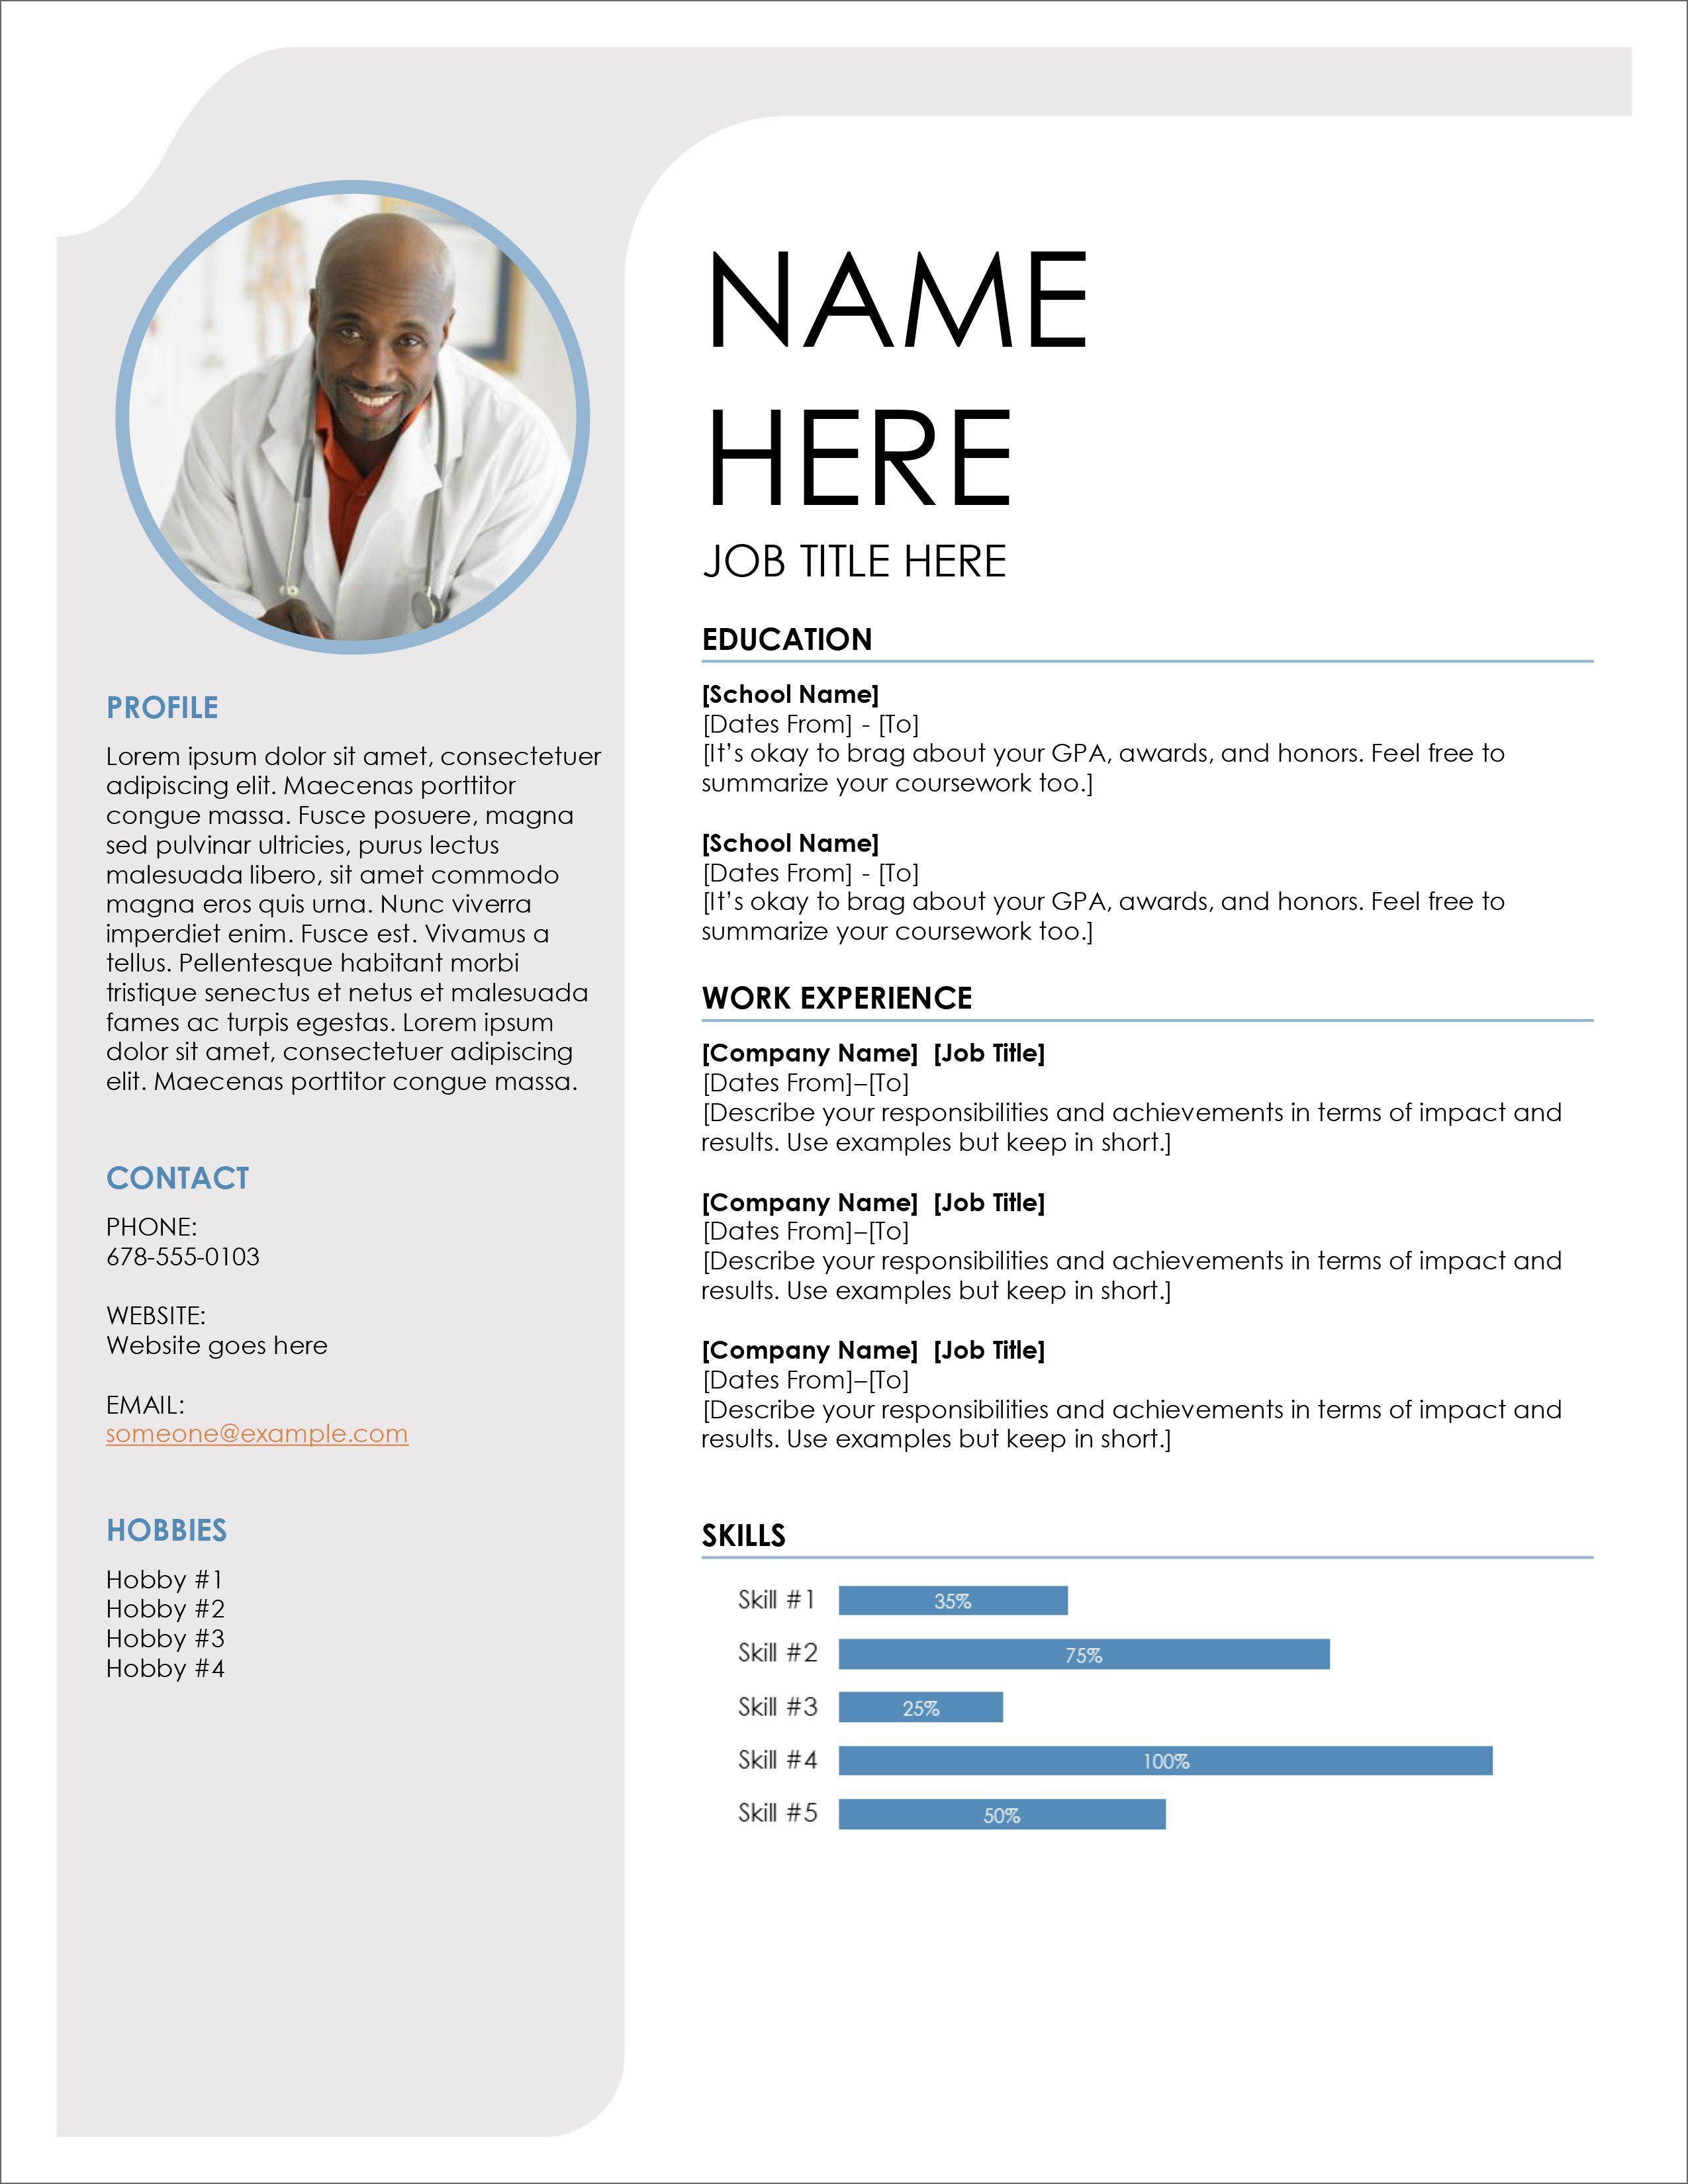 002 Best Resume Template Word 2003 Free Download Idea  DownloadsFull